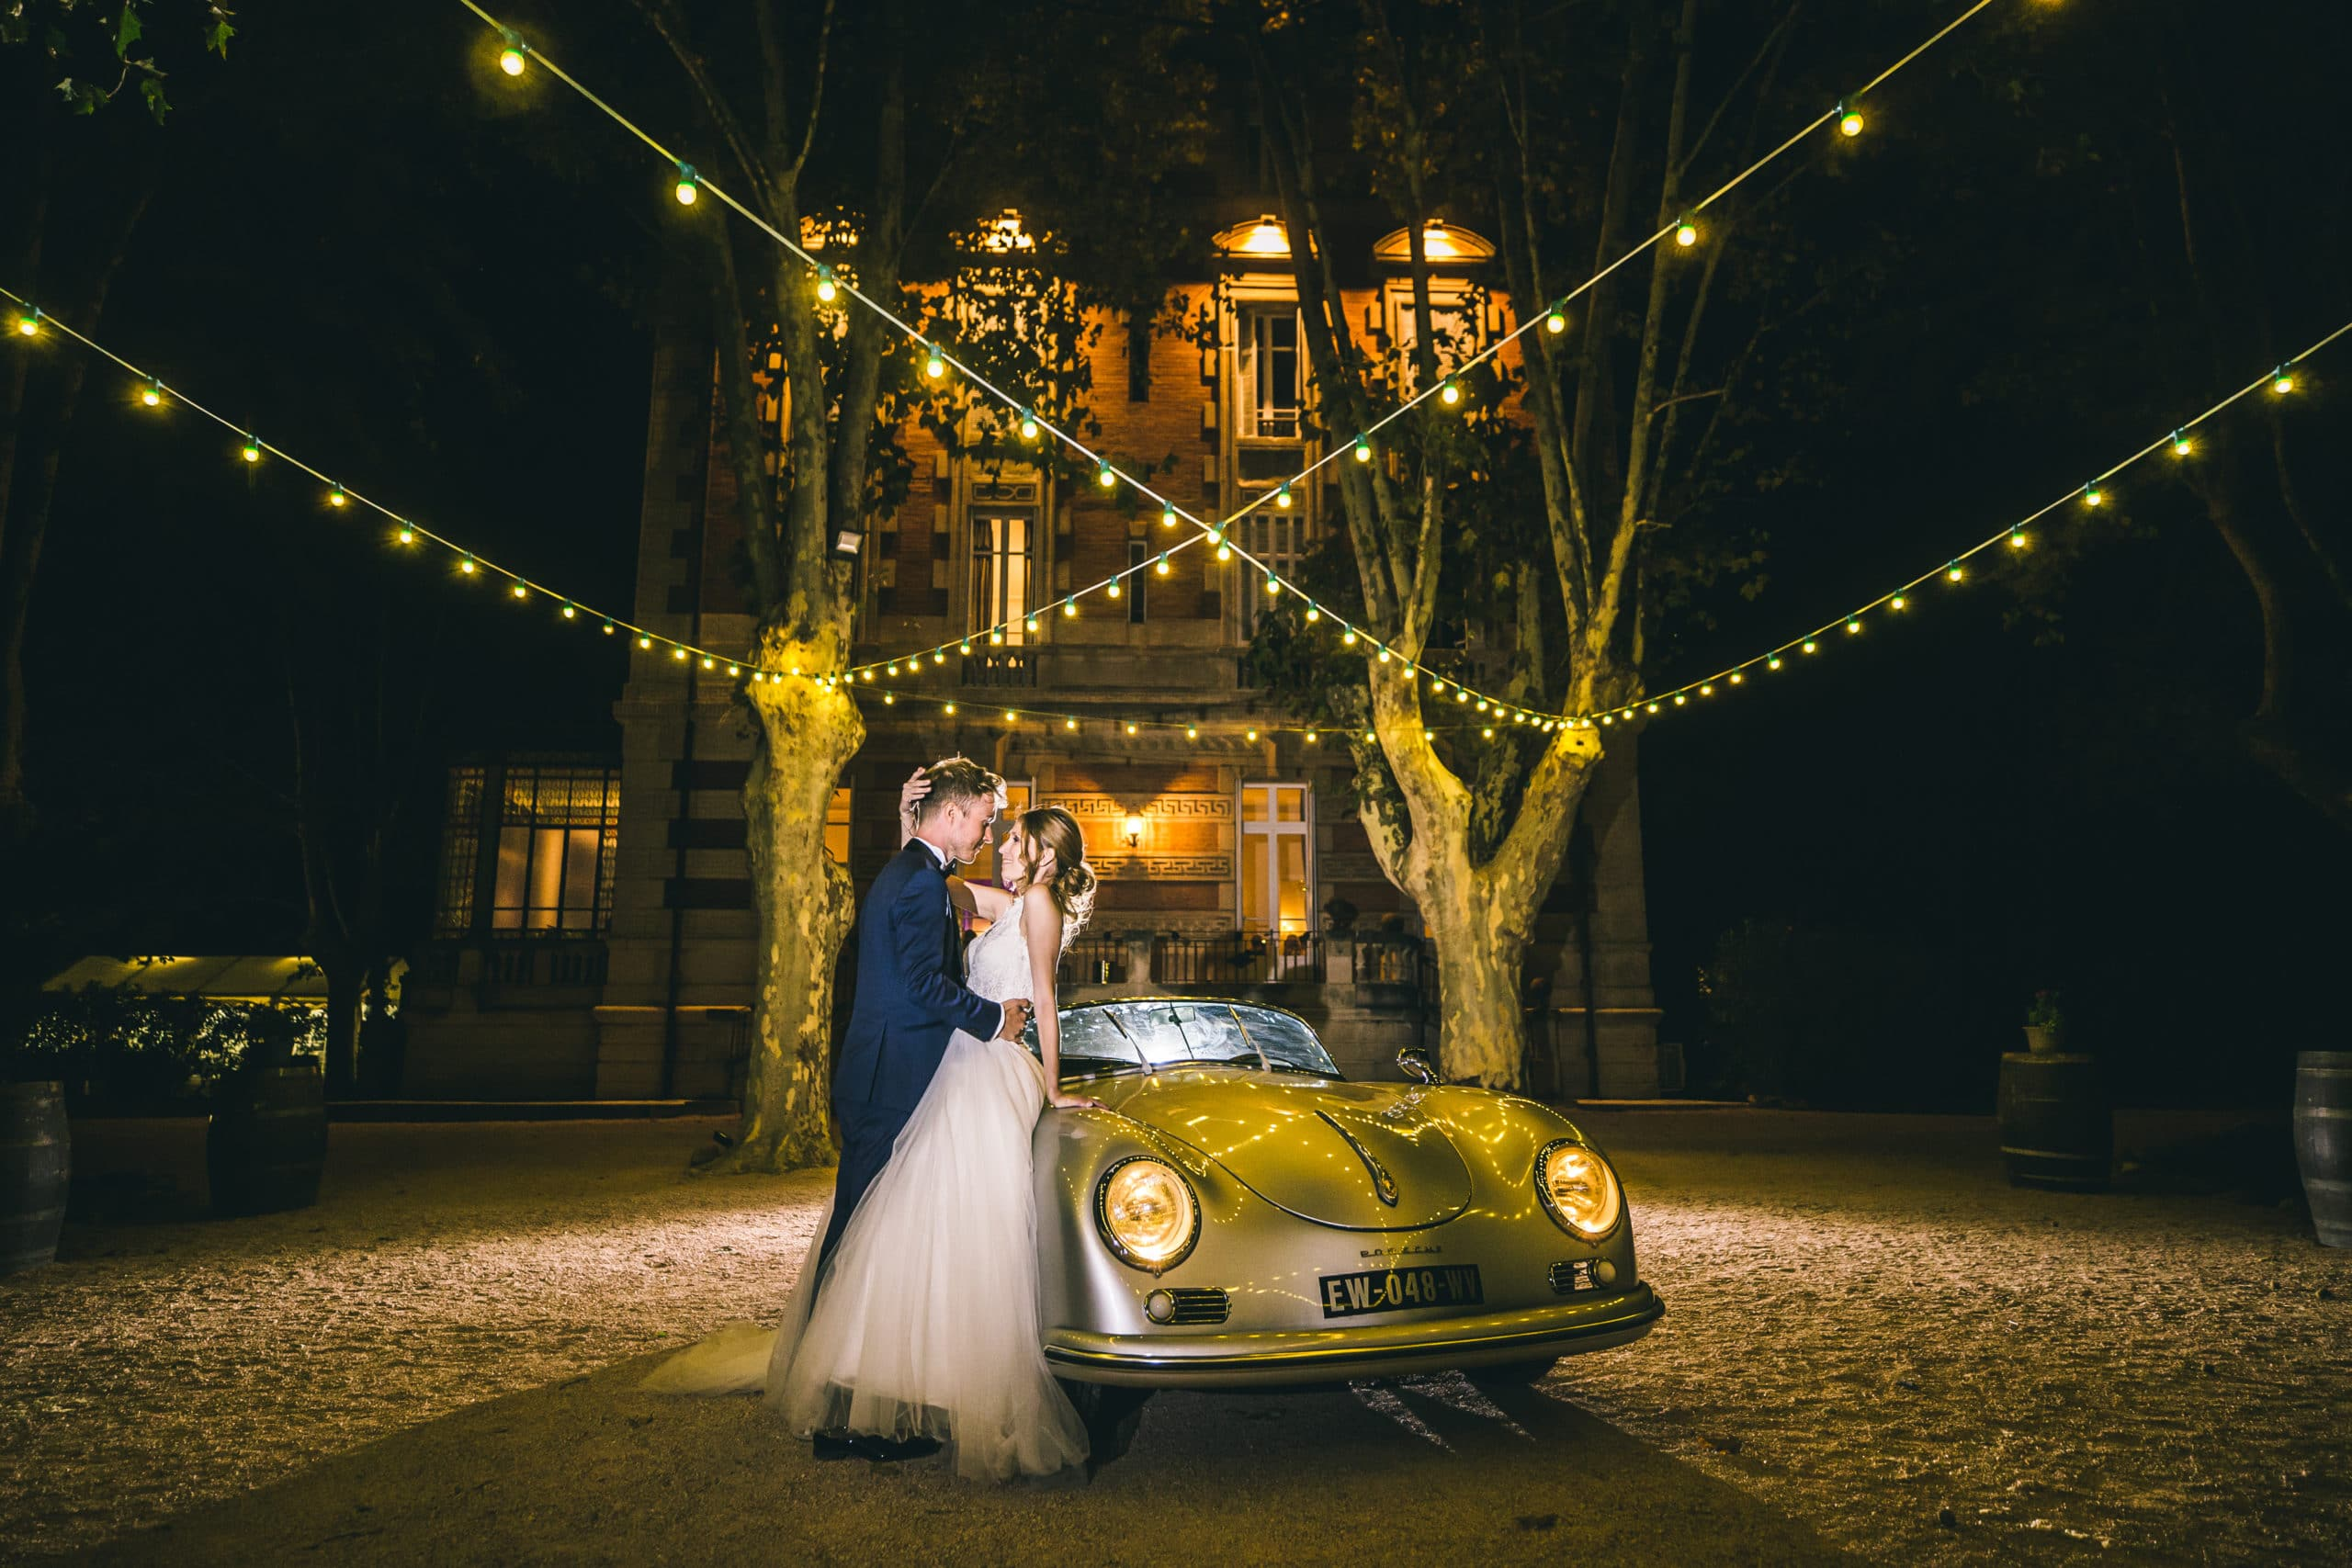 bride-groom-couple-porsche-car-lights-wedding-chateau-venue-reception-south-france-provence-magic